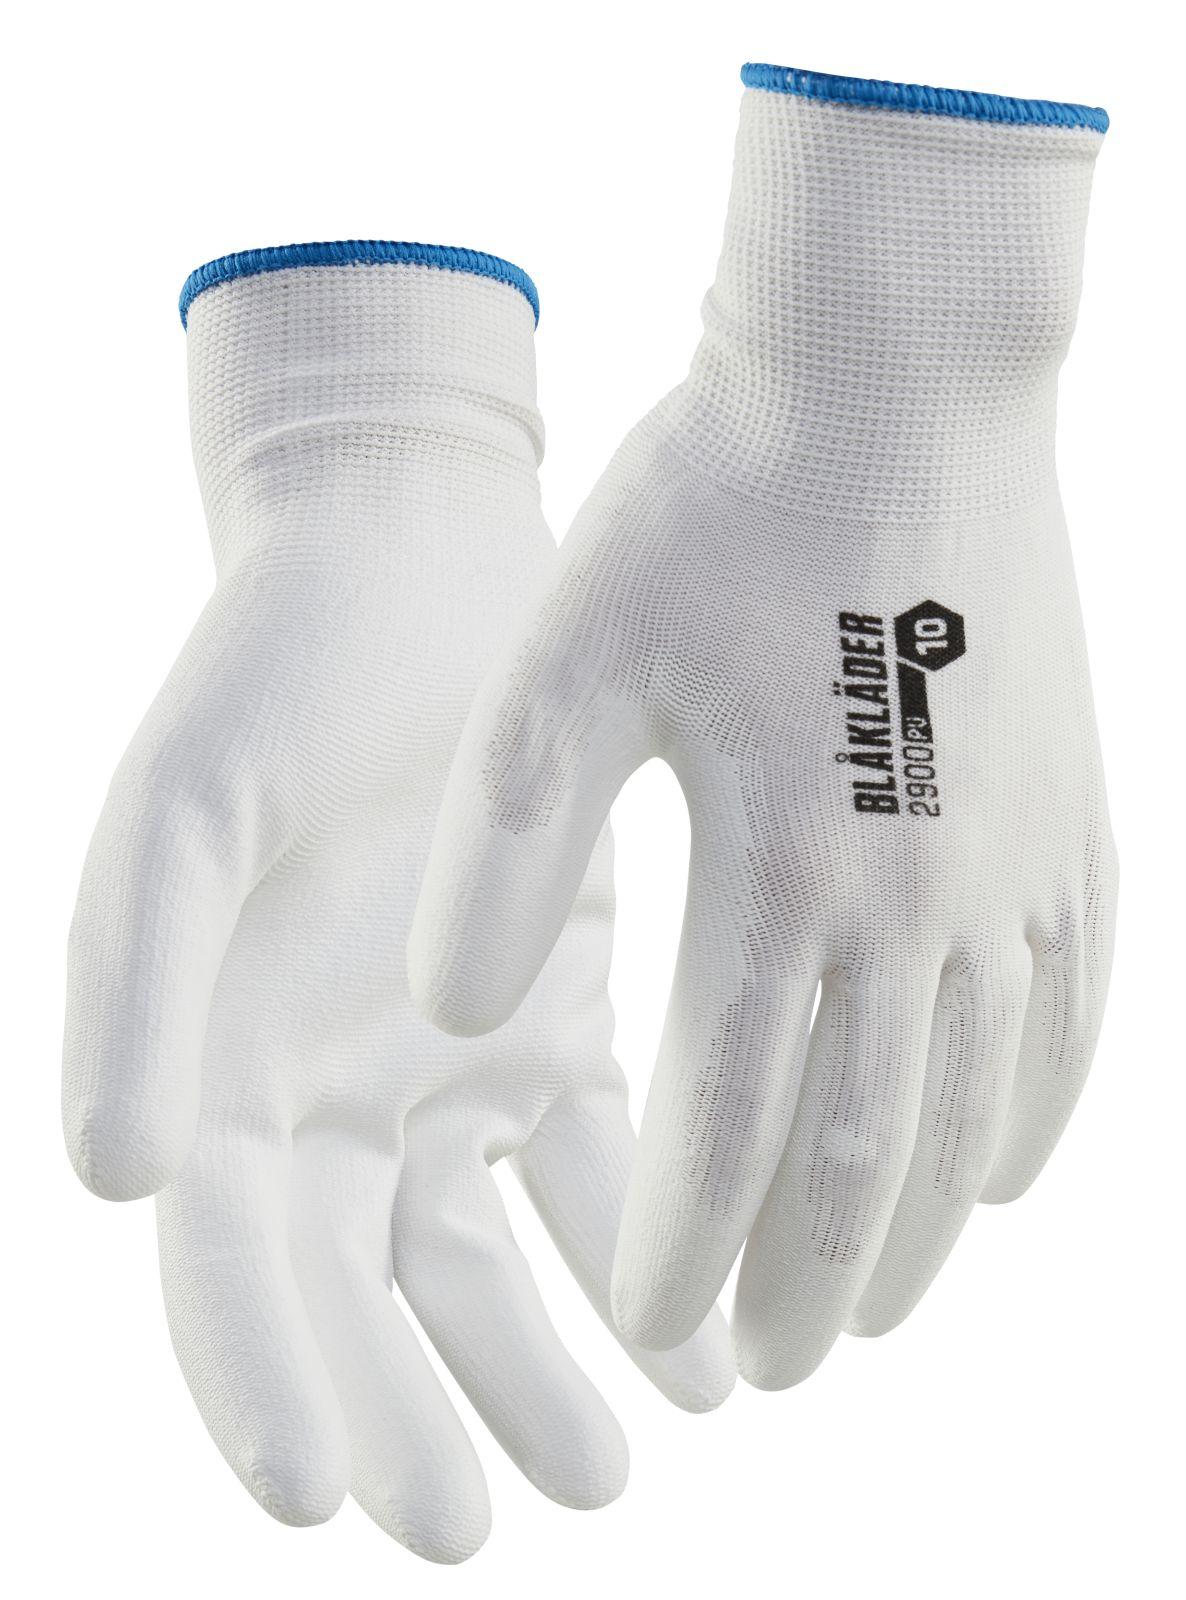 Blaklader Handschoenen 29001453 wit(1000)